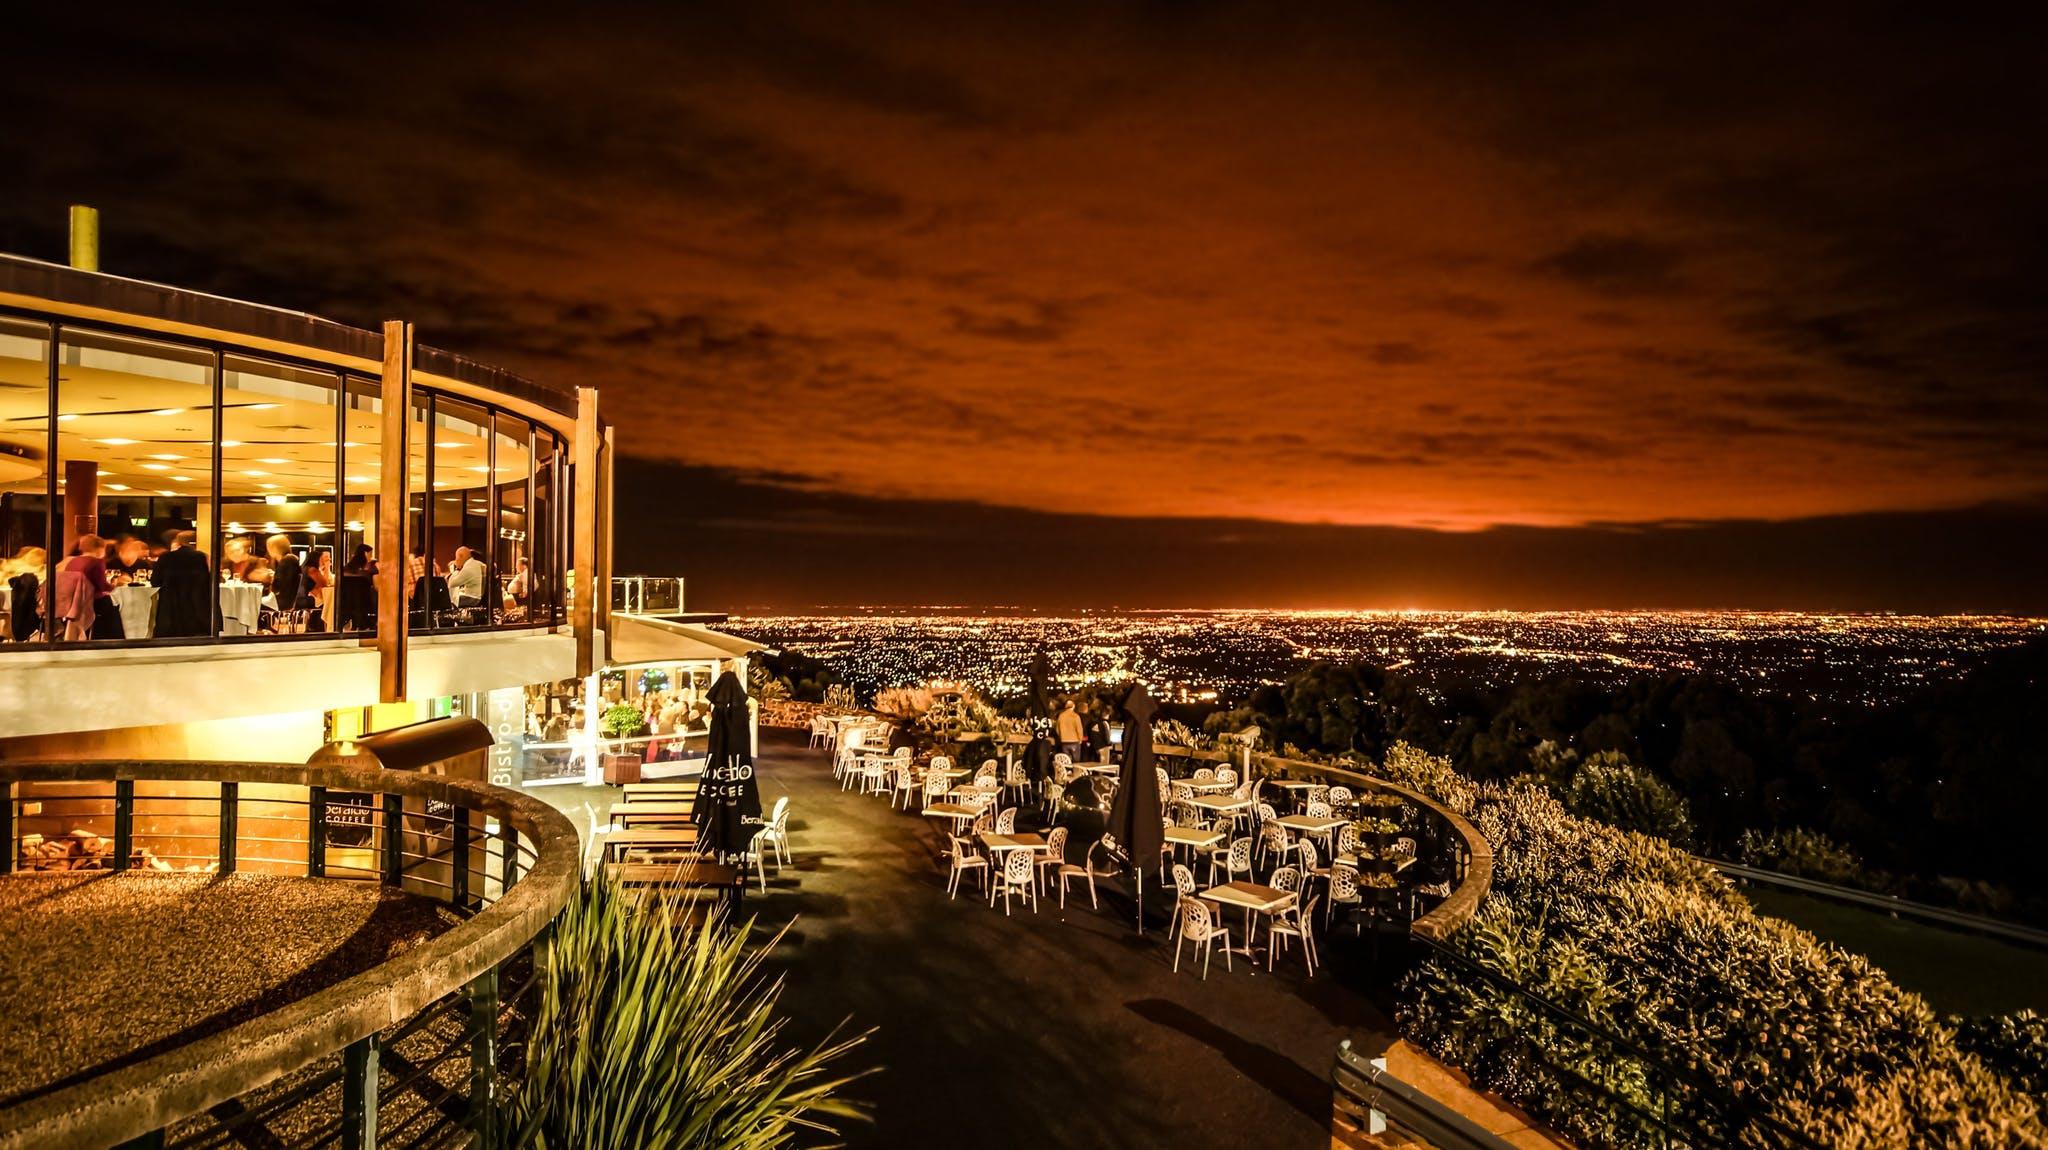 SkyHigh Mount Dandenong night view